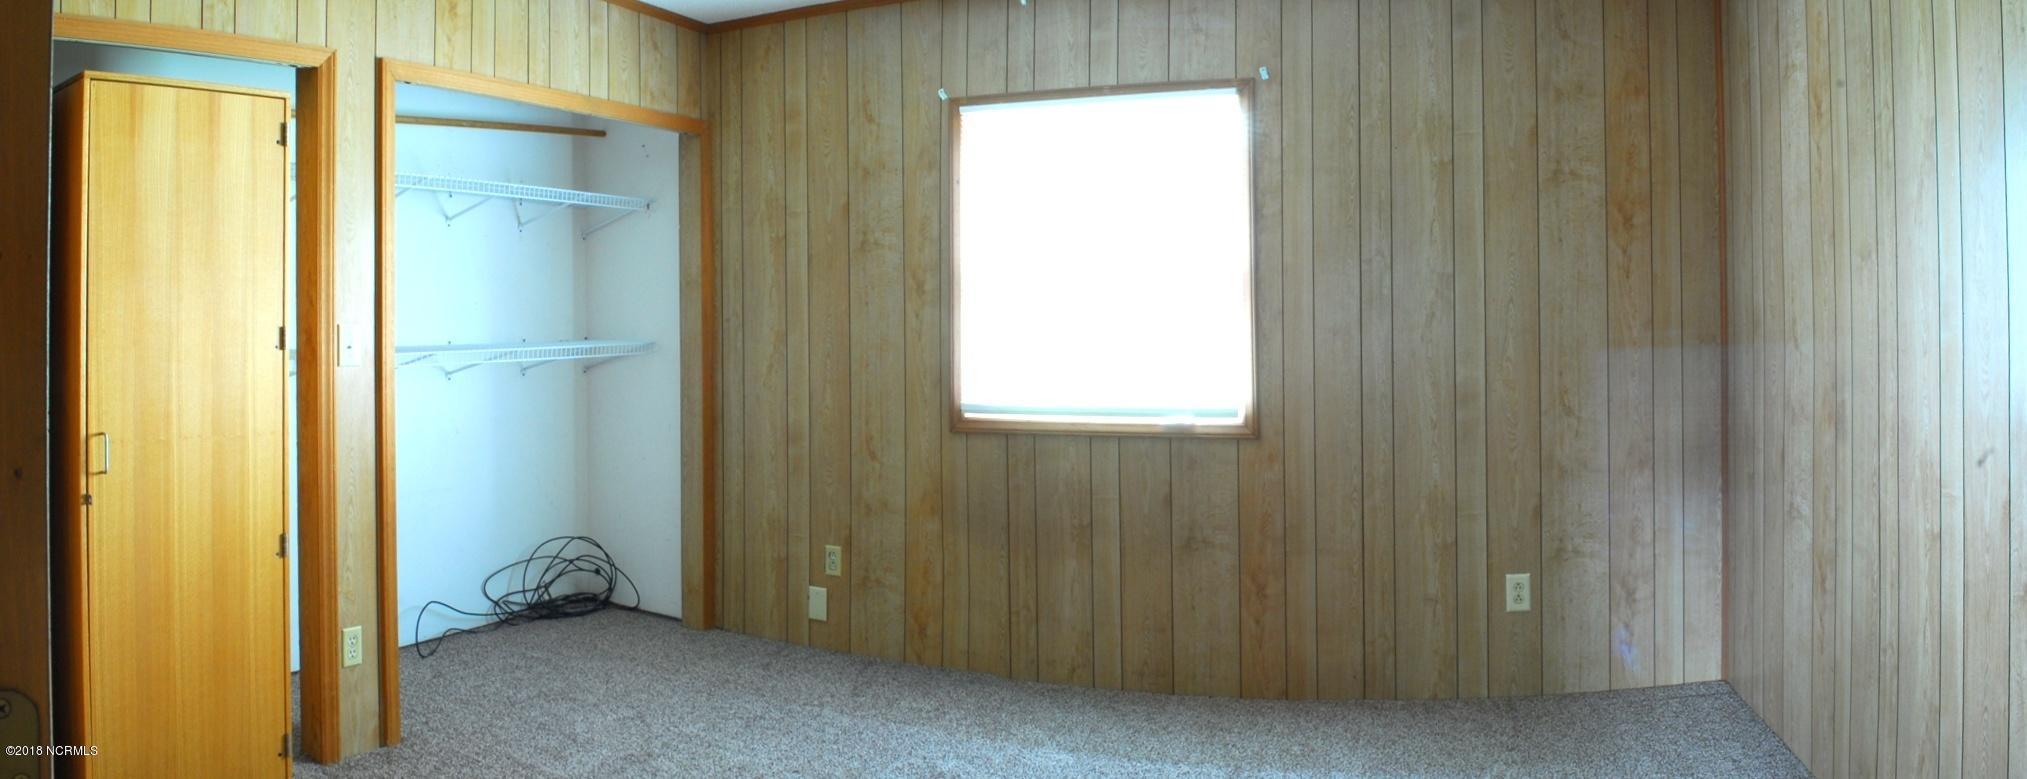 205 Barefoot Lane, Atlantic Beach, NC, 28512   MLS #100035645